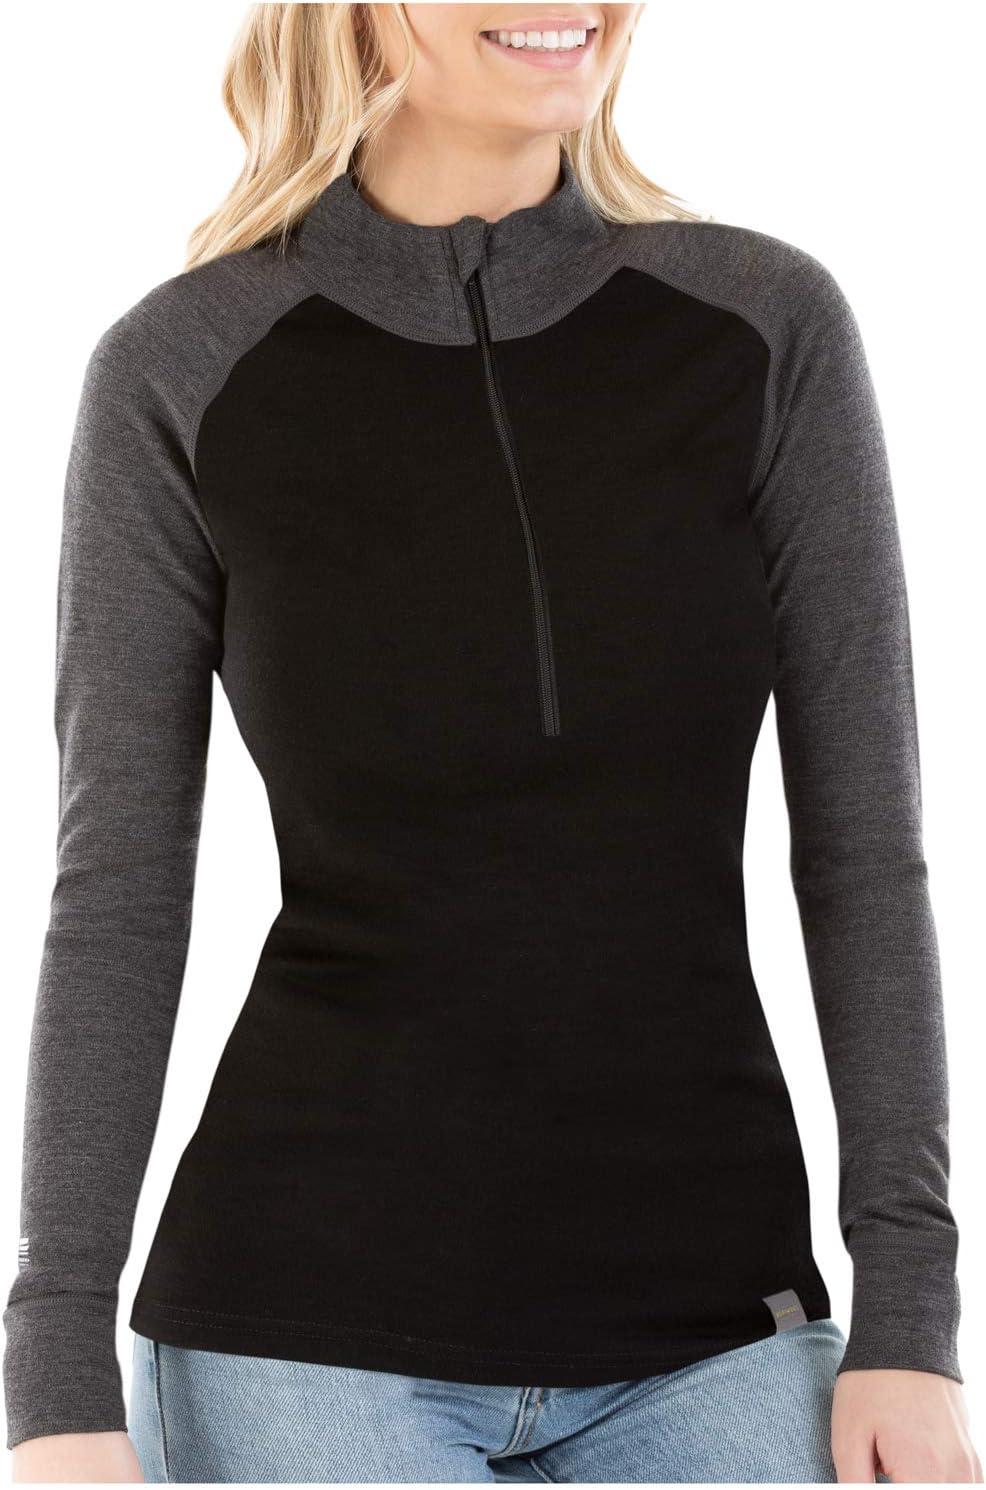 MERIWOOL Womens Base Layer 100% Merino Wool Midweight 250g Half Zip Sweater for Women: Clothing